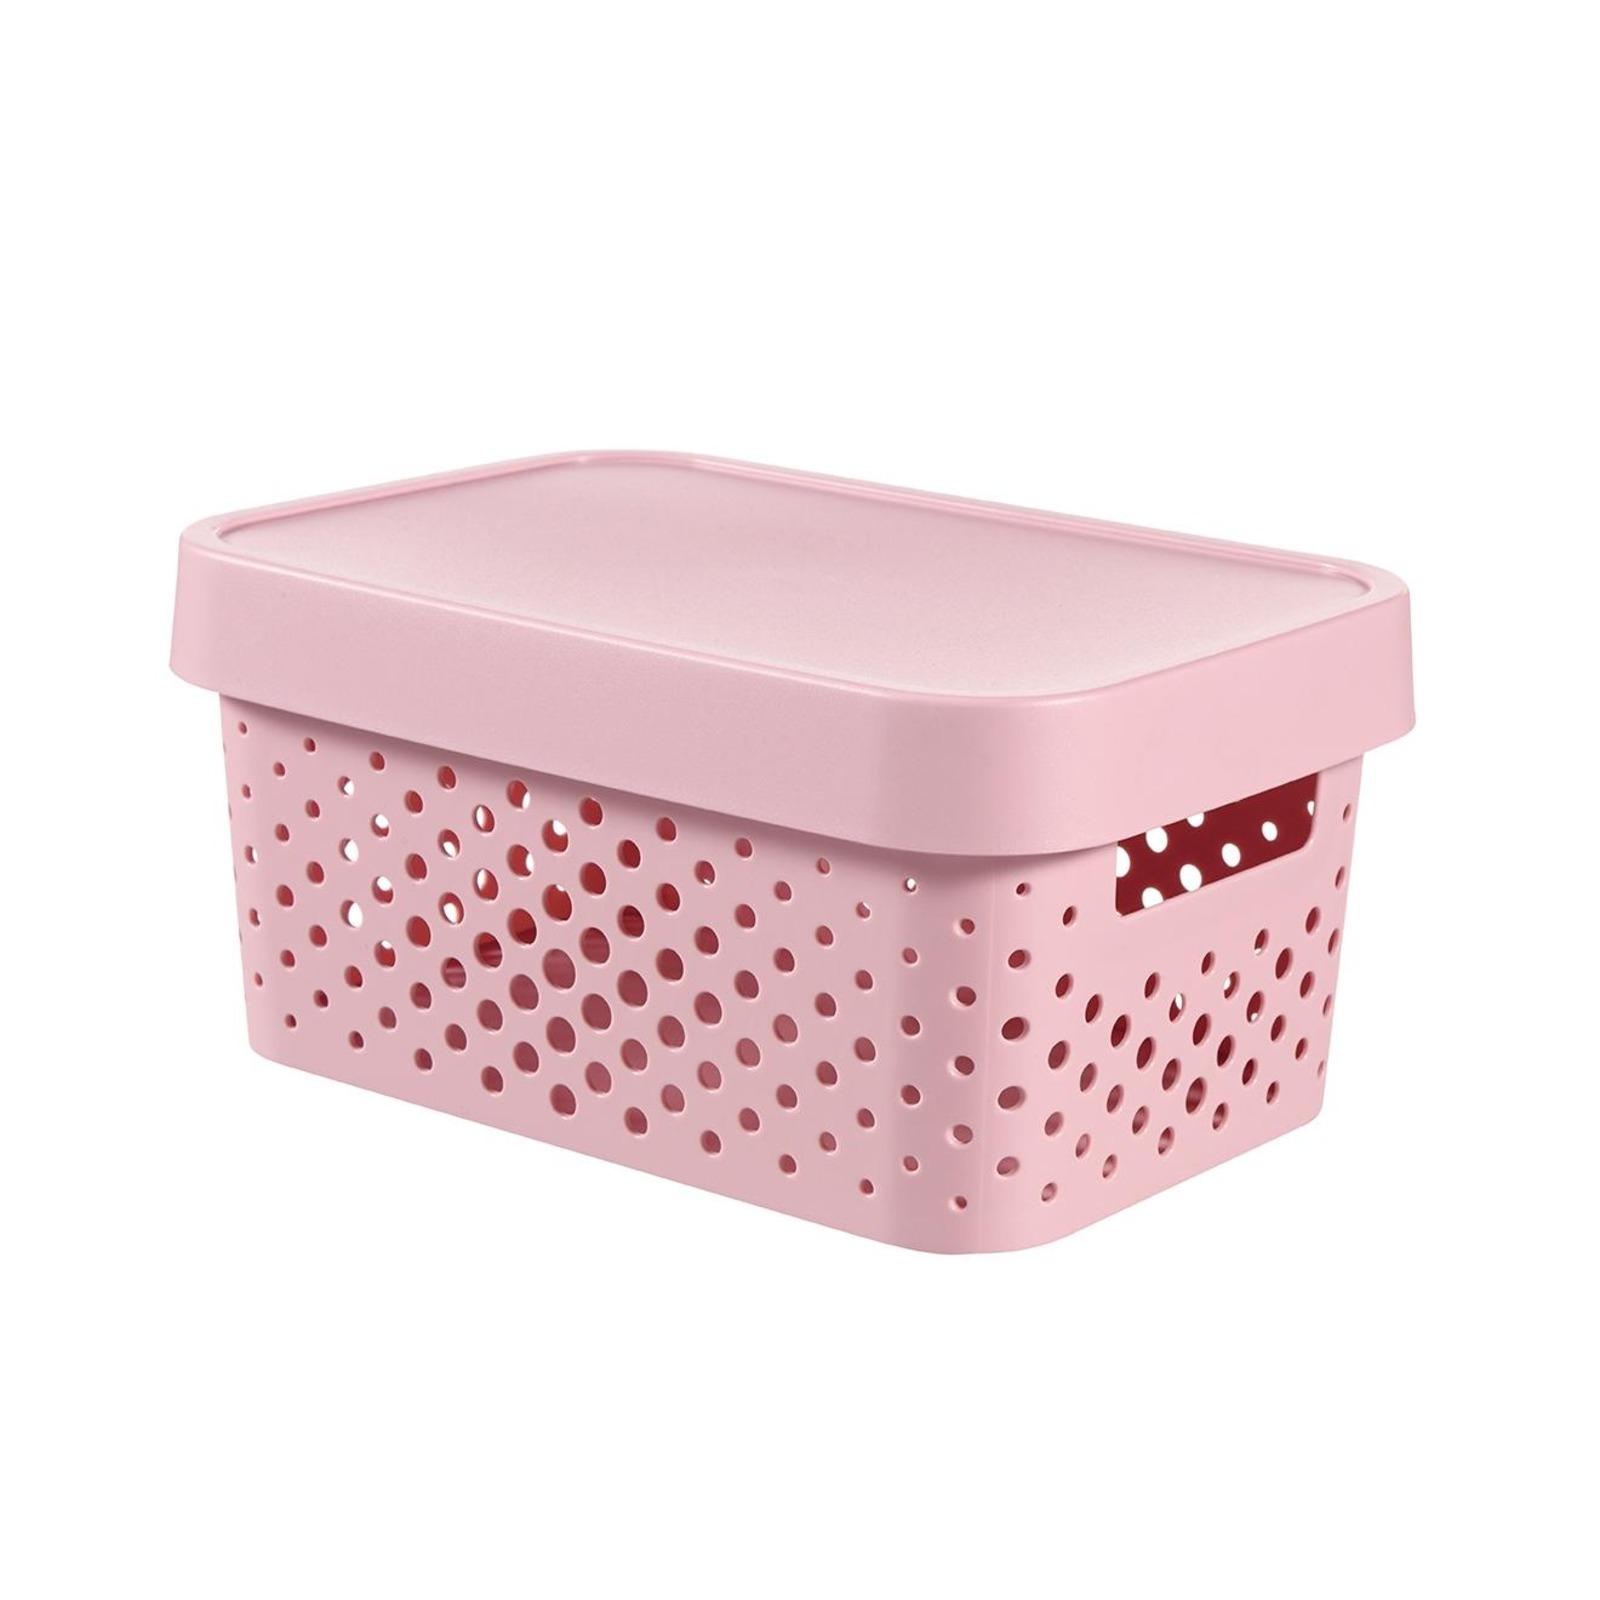 CURVER Infinity Box Dots 4.5L + Lid Pink